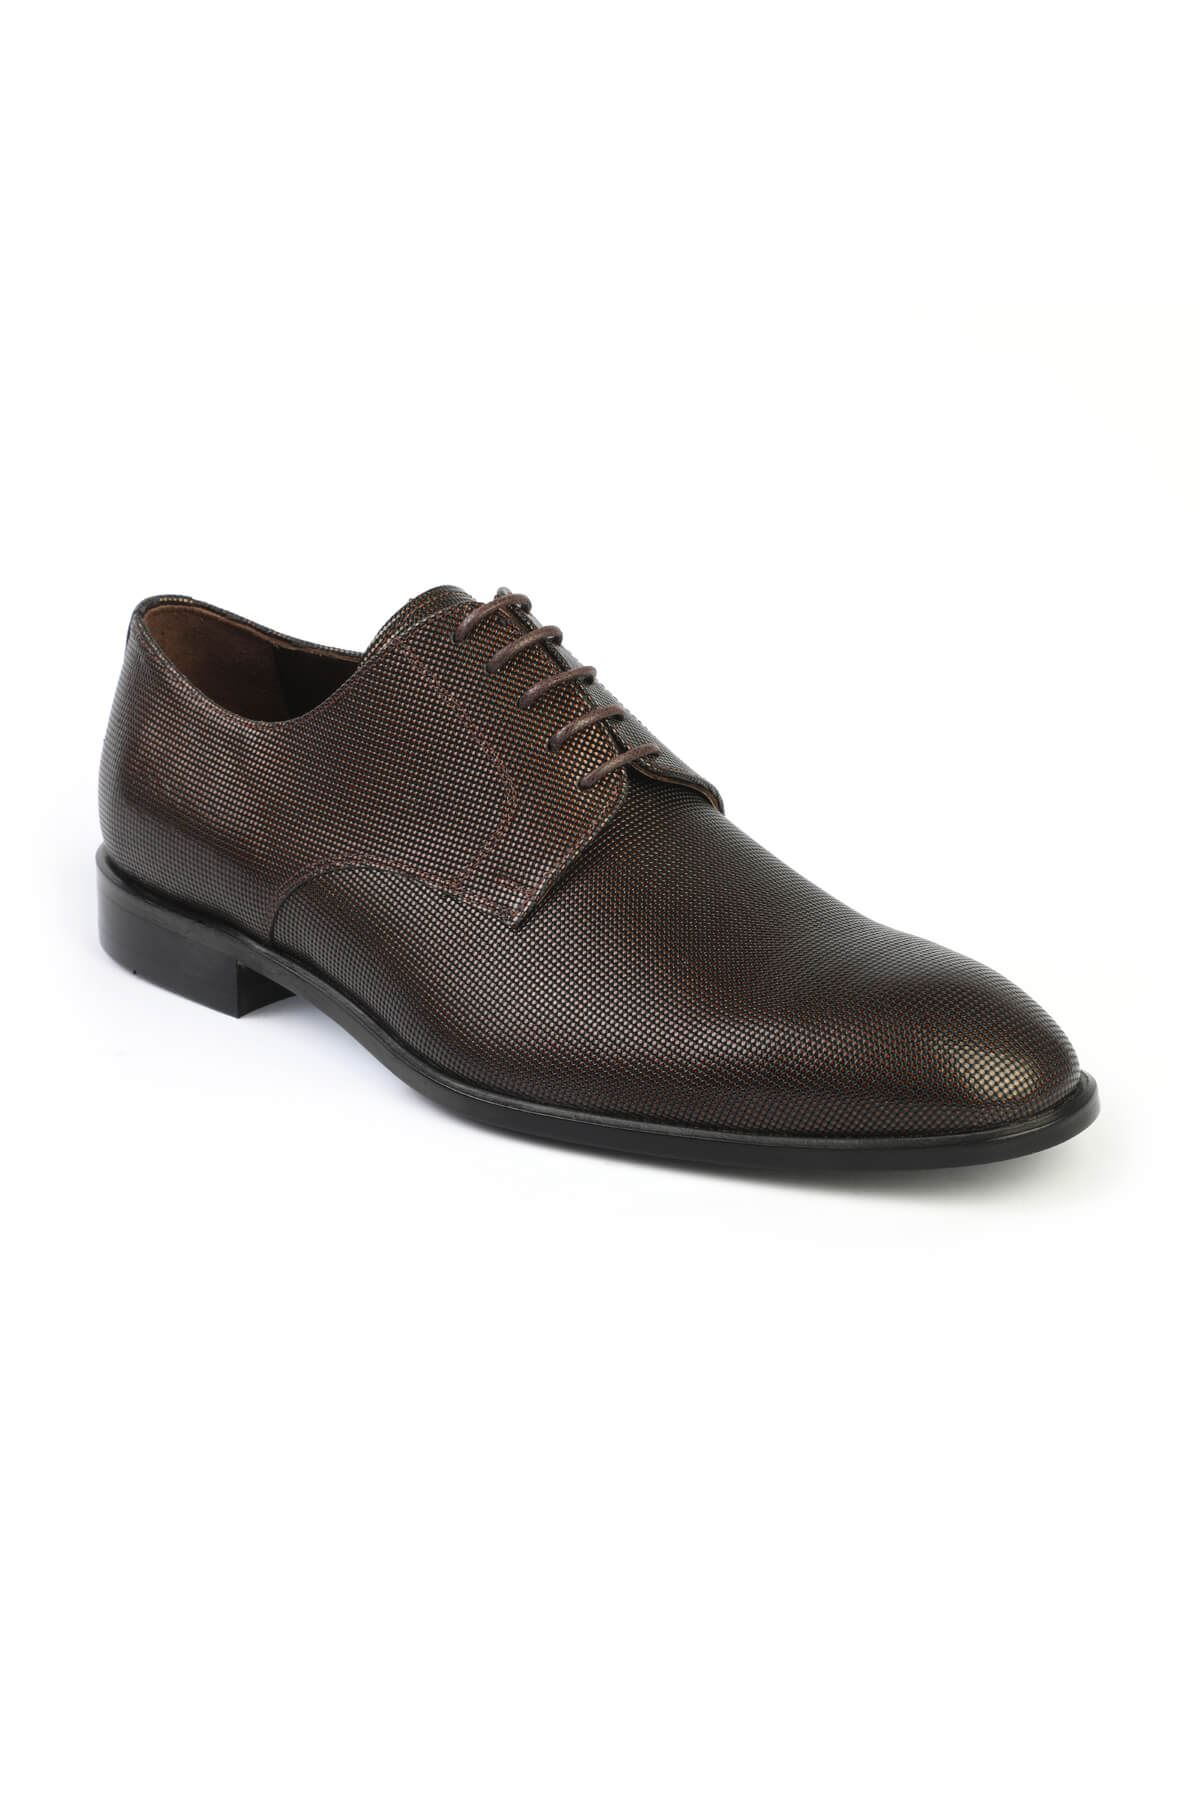 Libero 2716 Brown Classic Shoes